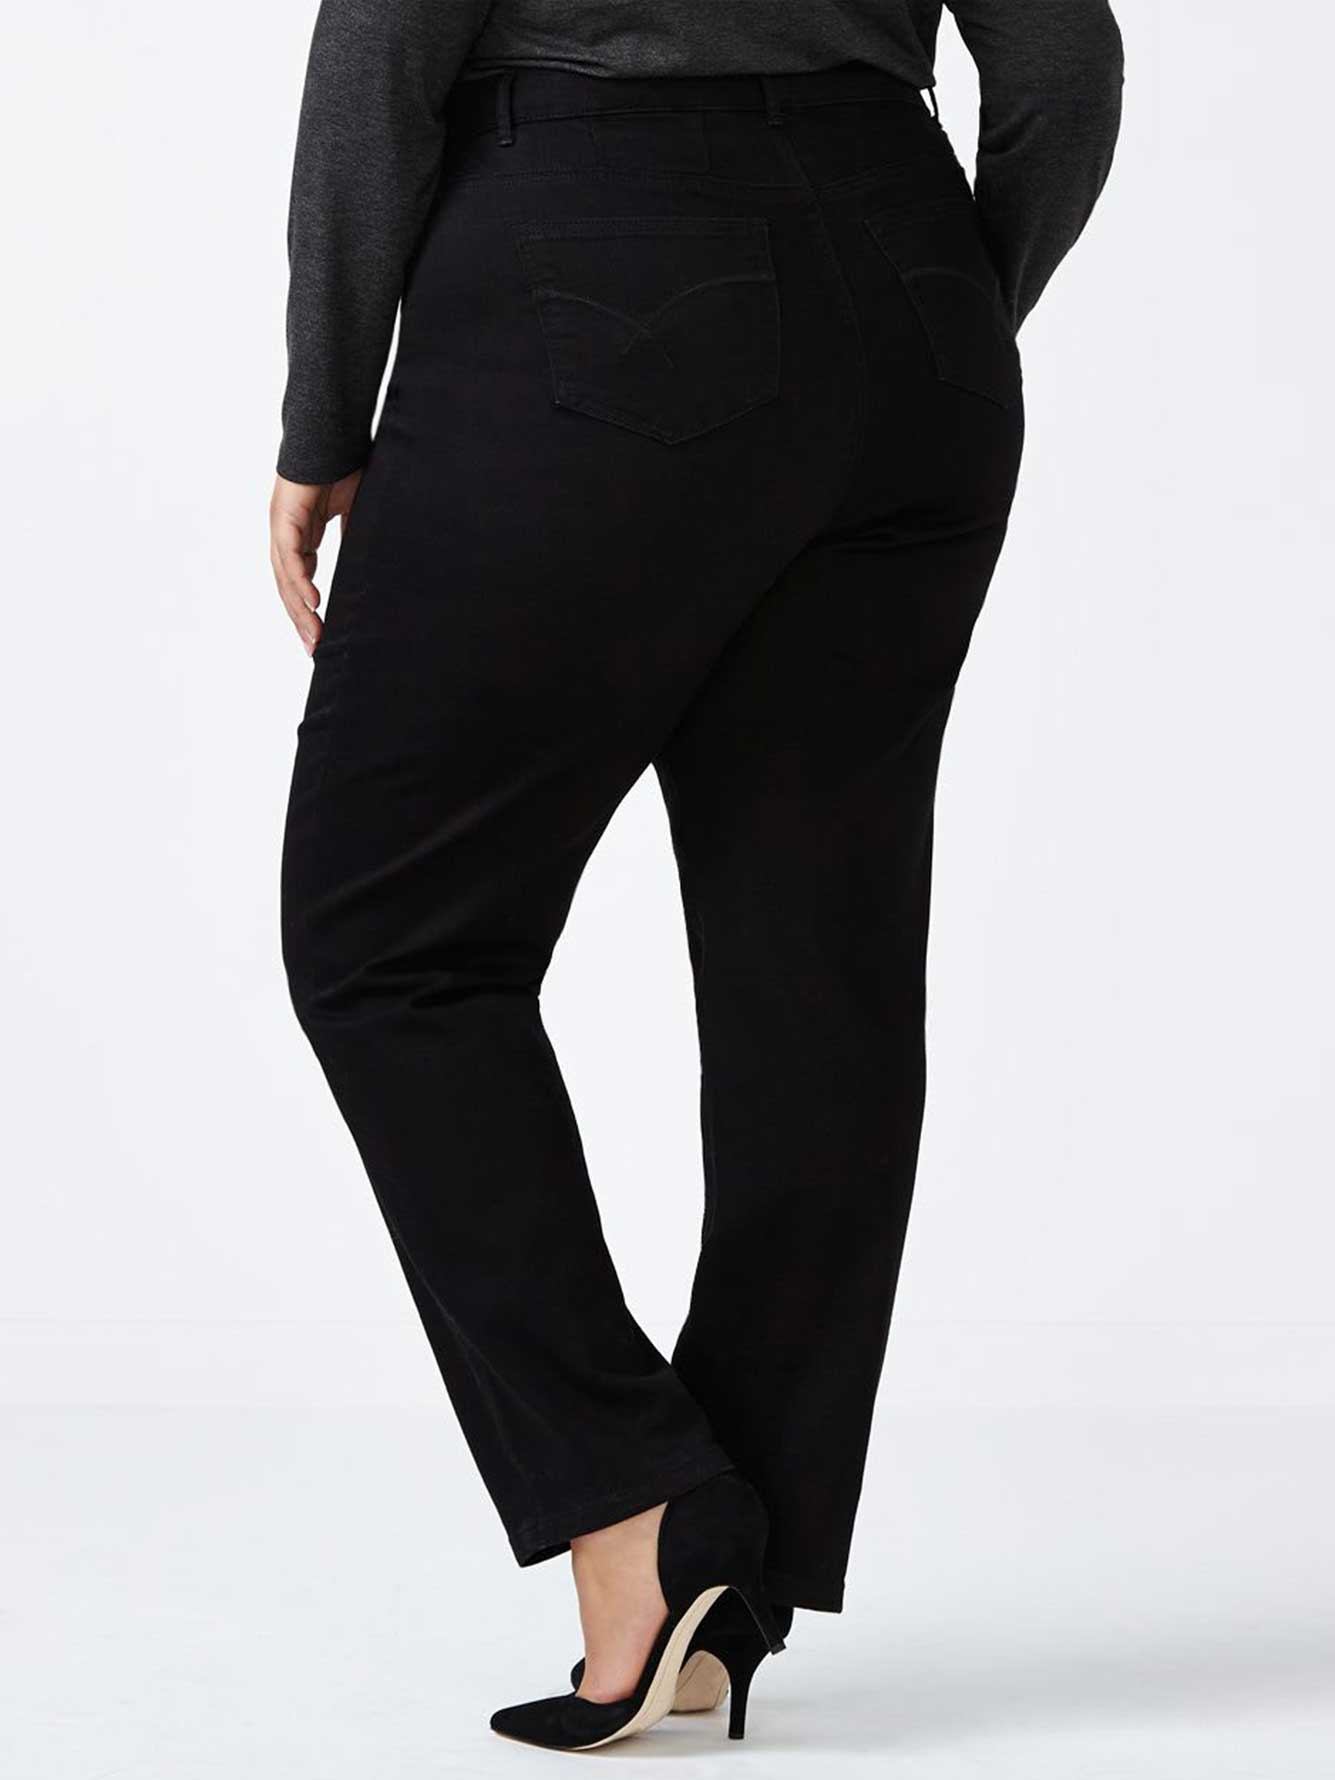 cc4822fd54d Plus Size Clothing - Stylish   Trendy Plus Size Fashions